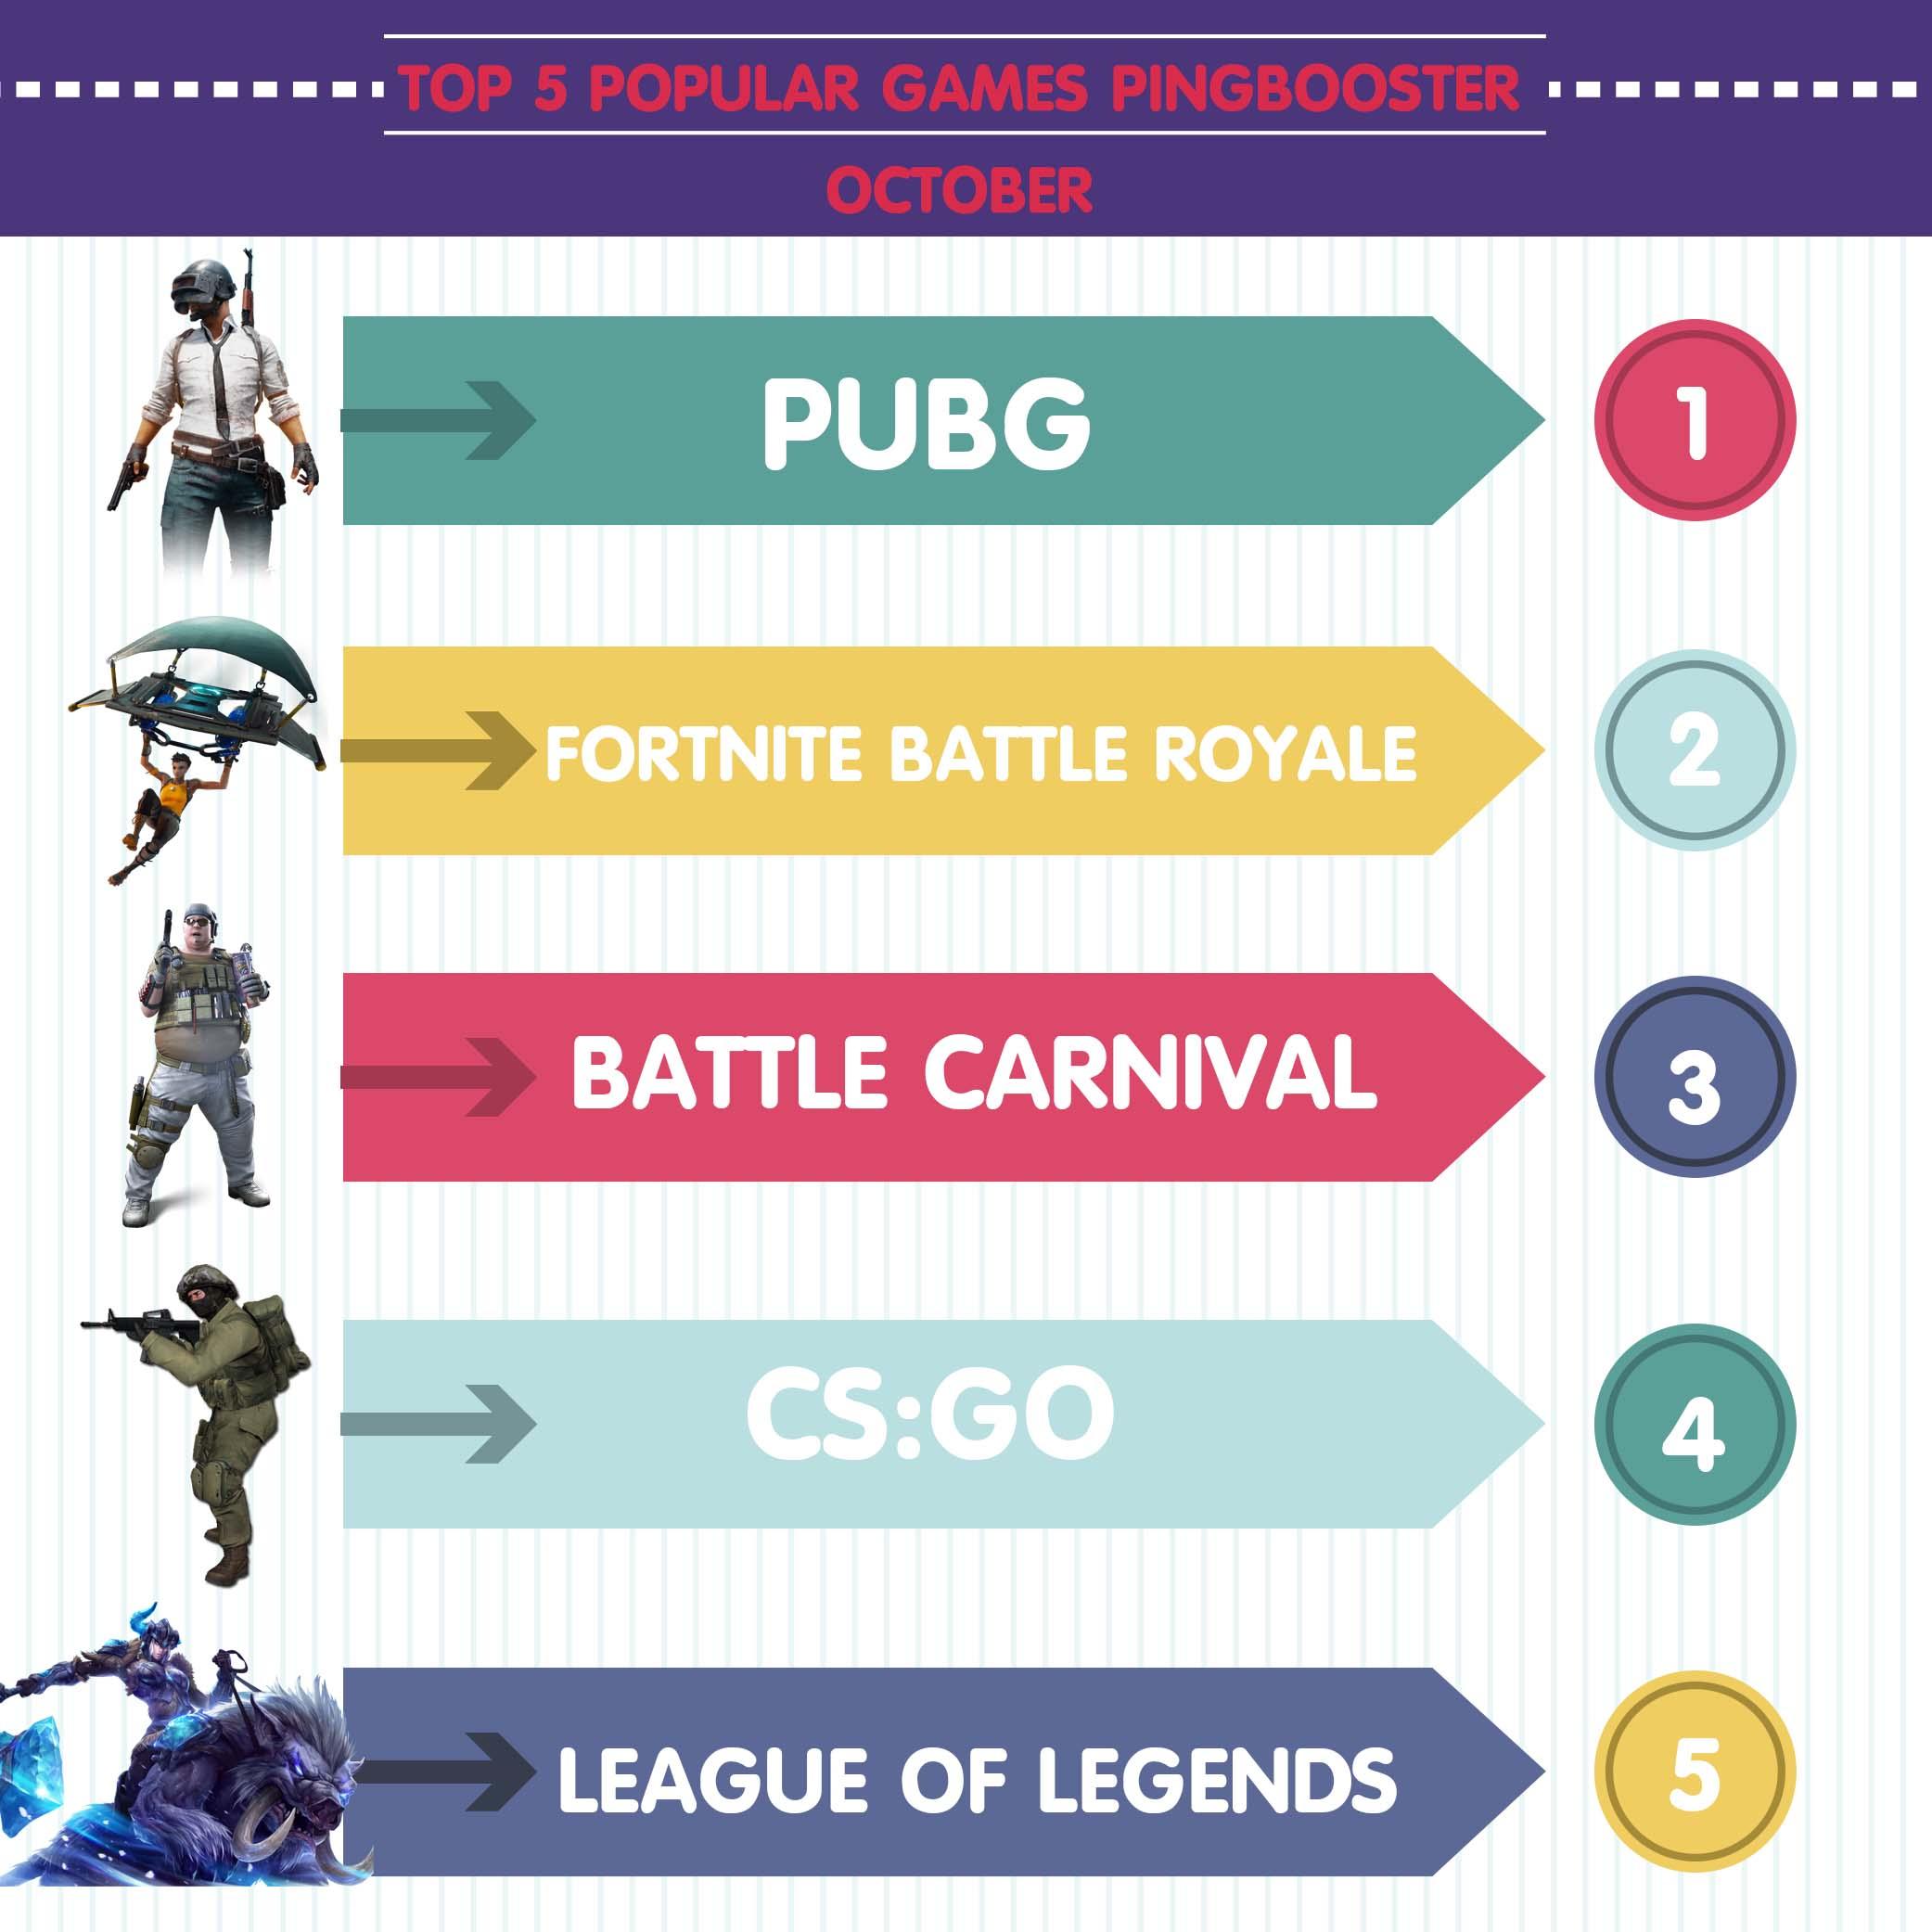 Top 5 Popular Games PingBooster In October